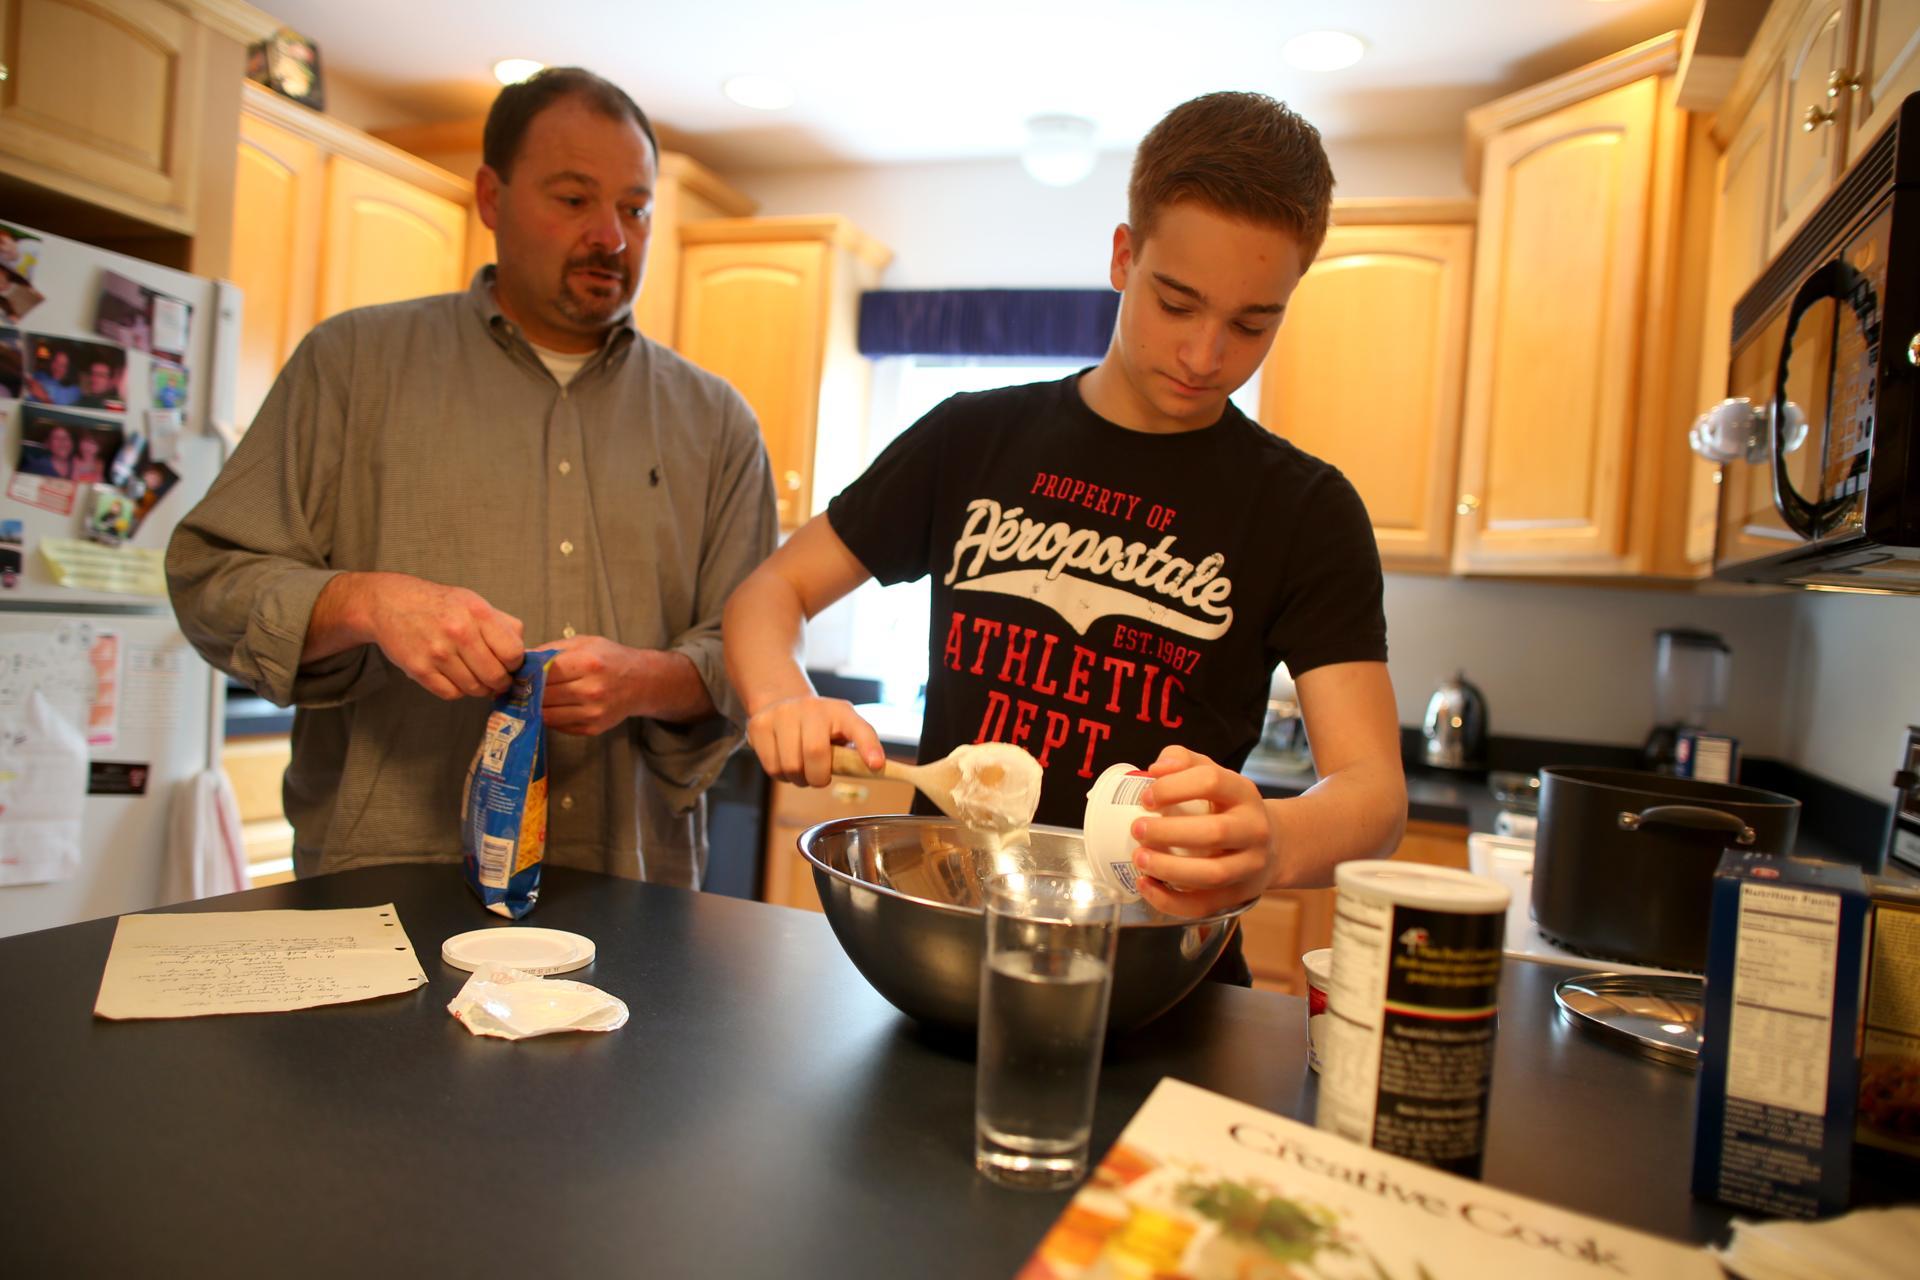 Food-savvy dads at the stove - The Boston Globe